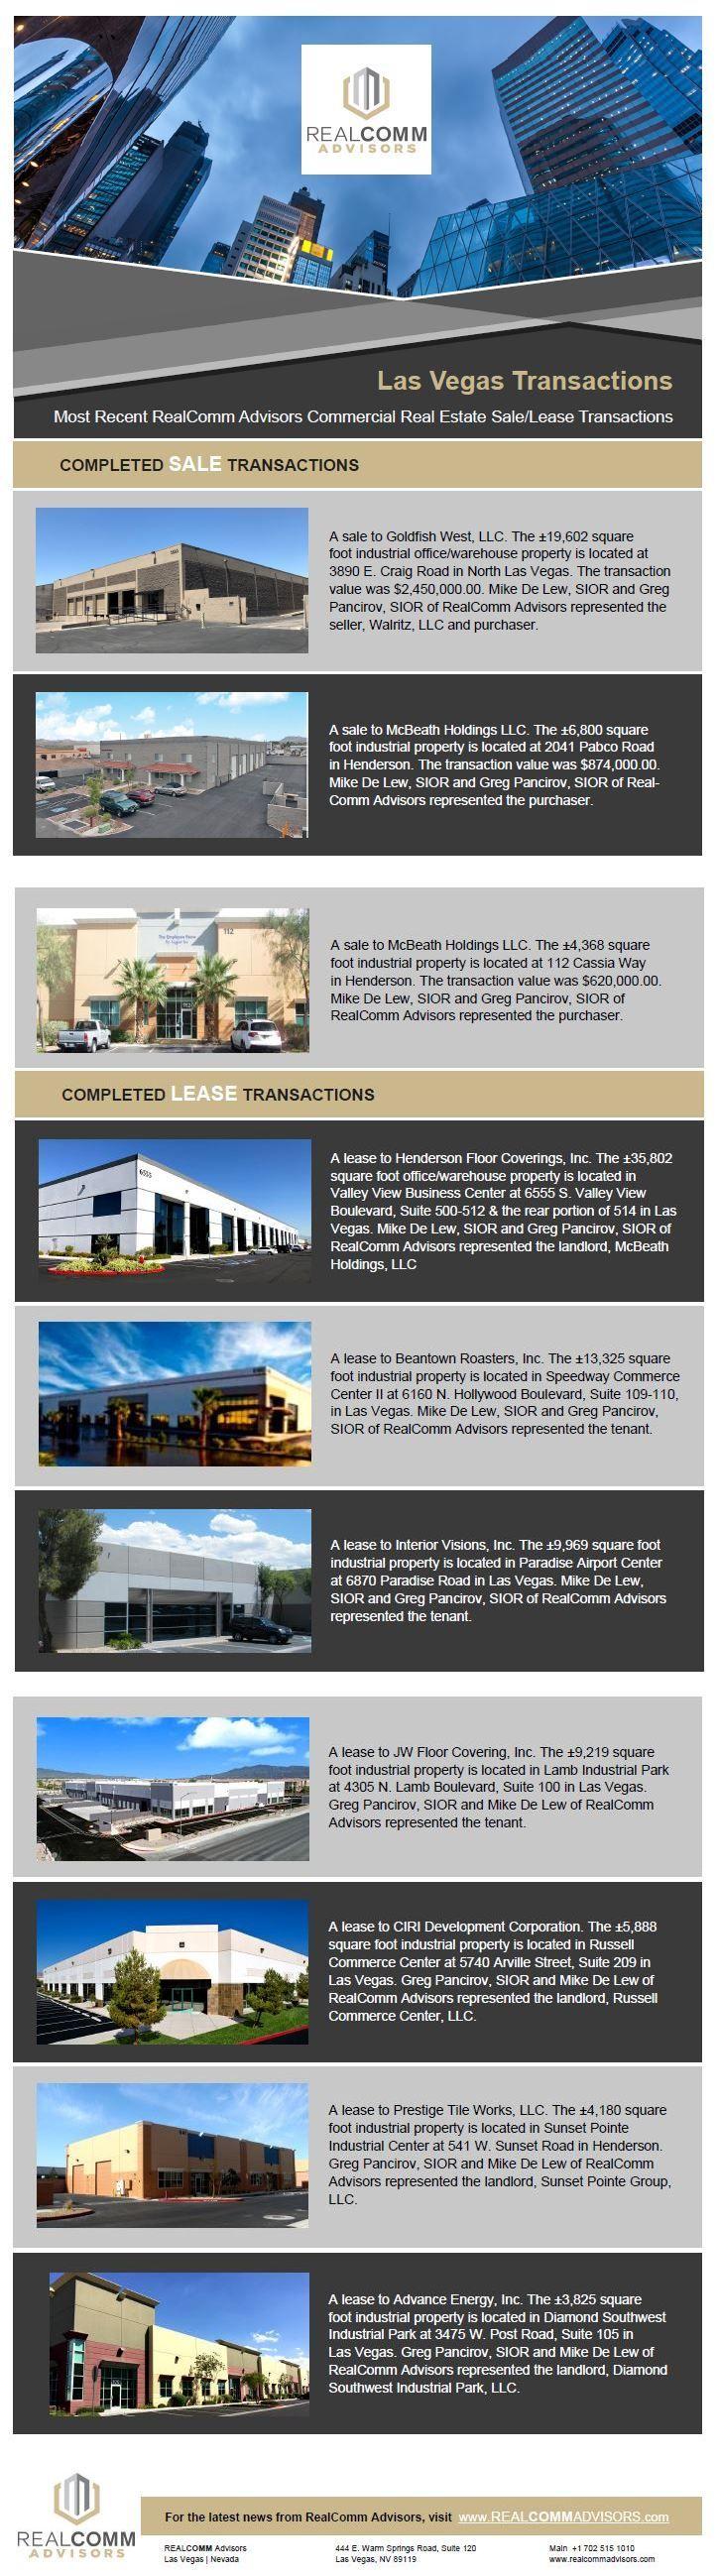 Las Vegas Transactions Most Recent RealComm Advisors Commercial Real Estate Sale Lease